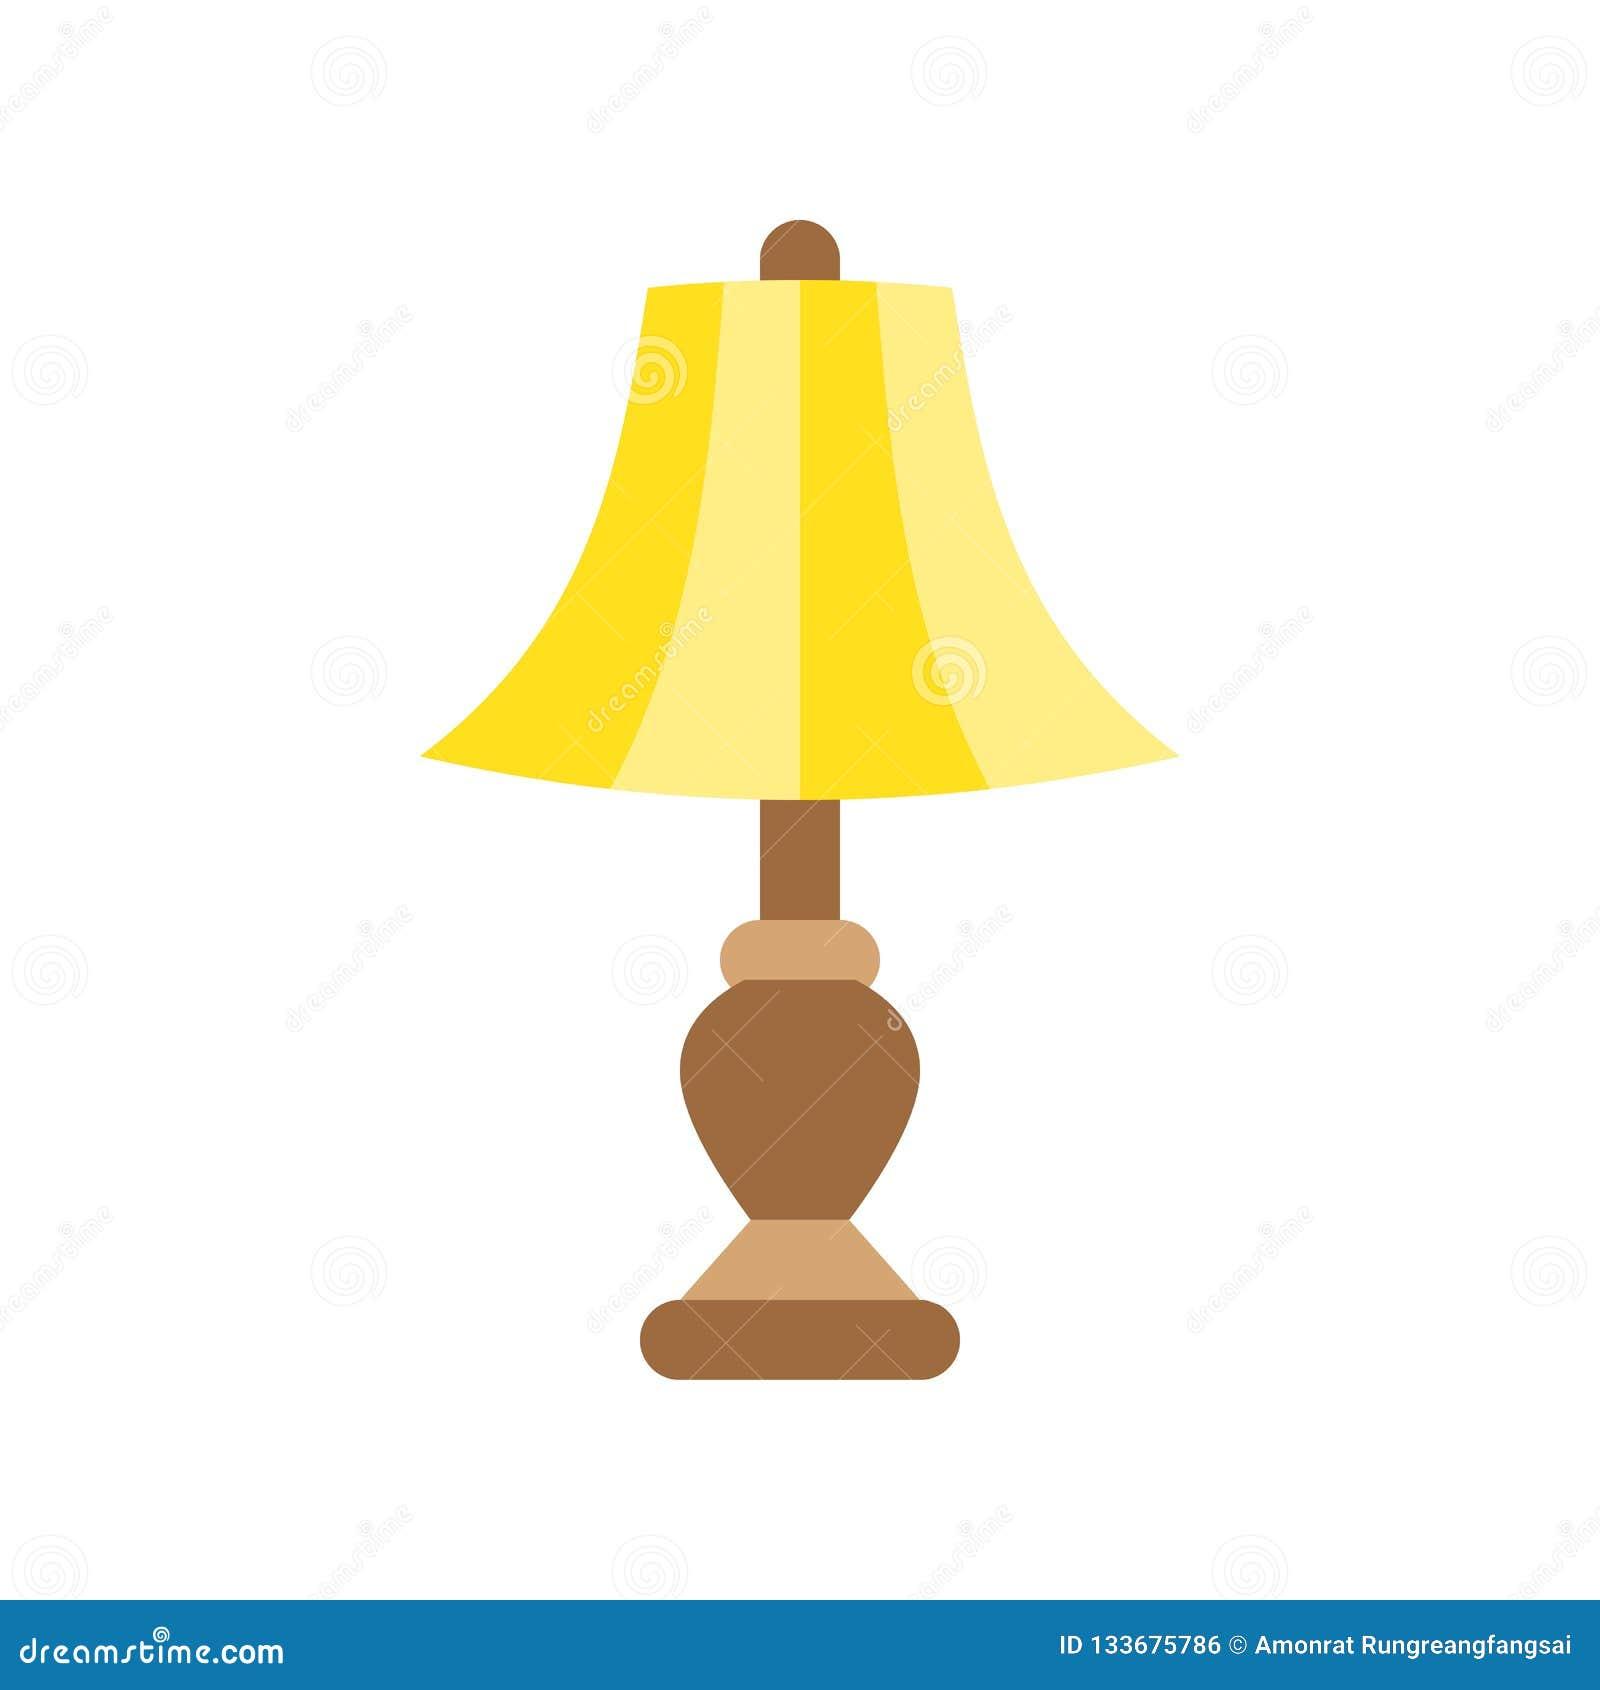 Lantern or lamp vector icon, flat style